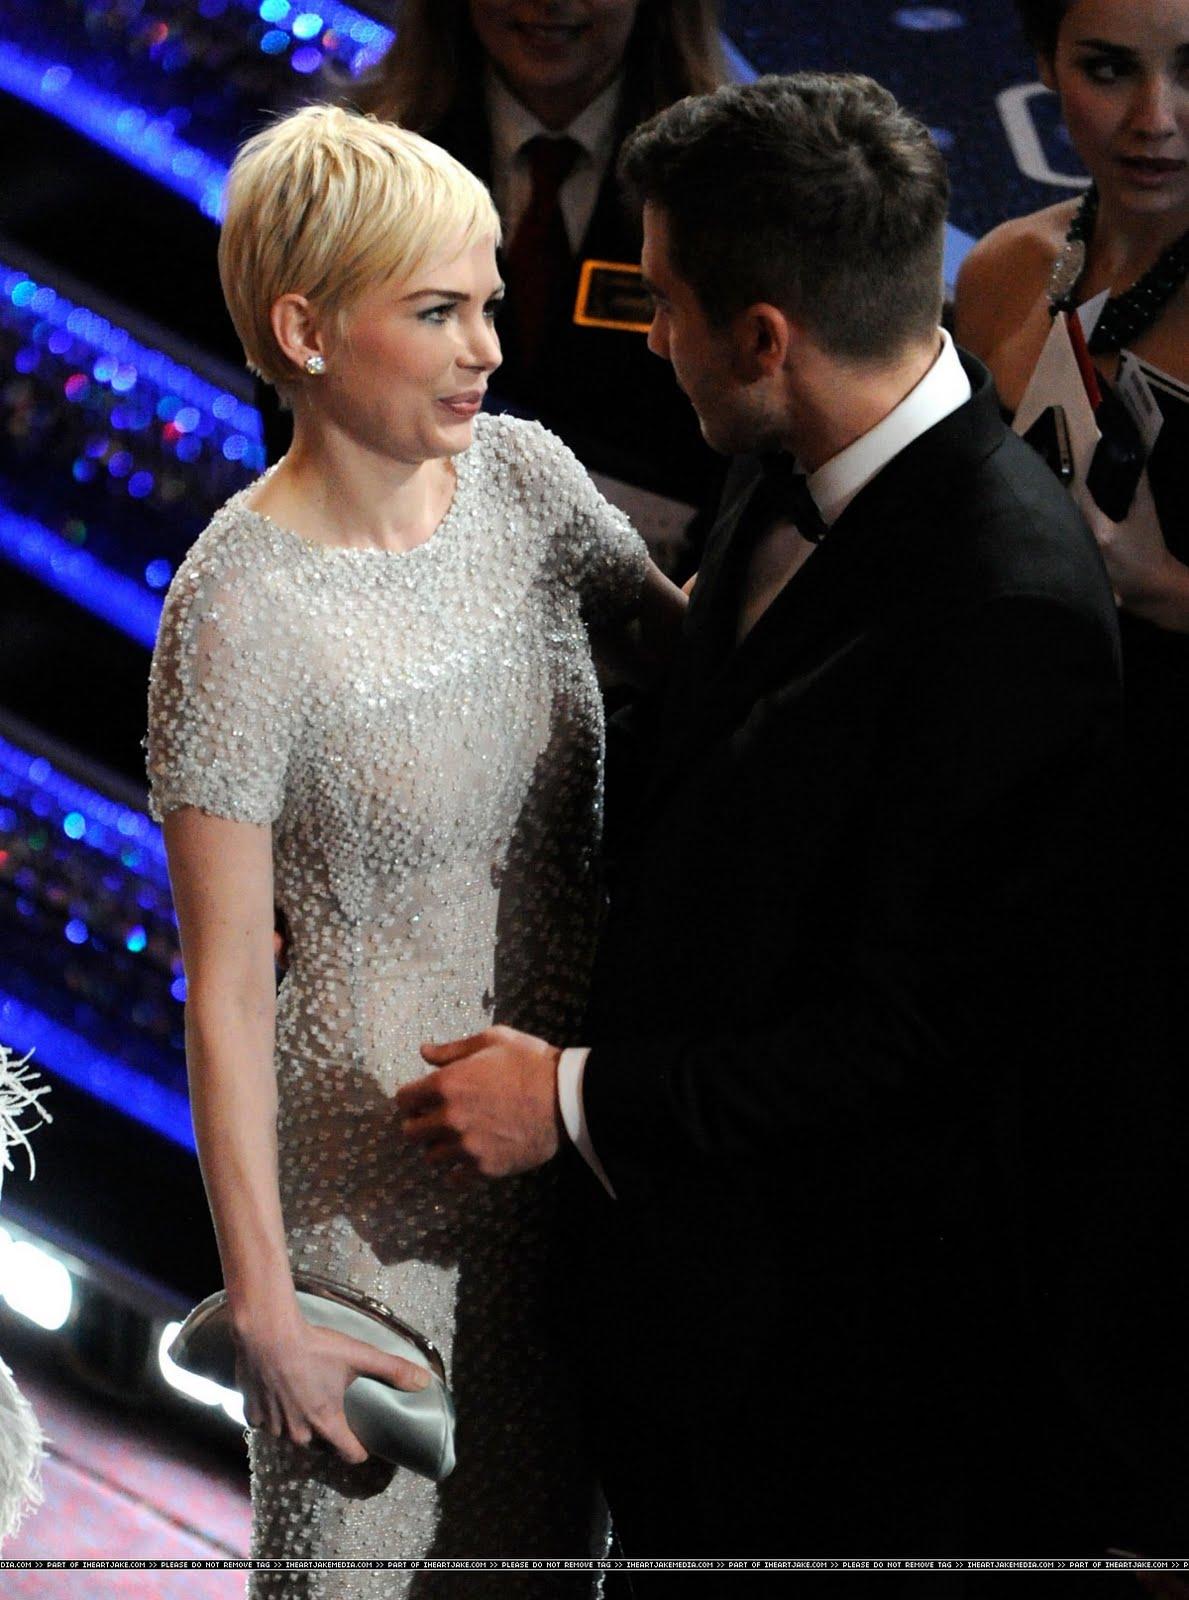 Mais fotos da Michelle no Oscar Aqui  Jake Gyllenhaal And Michelle Williams